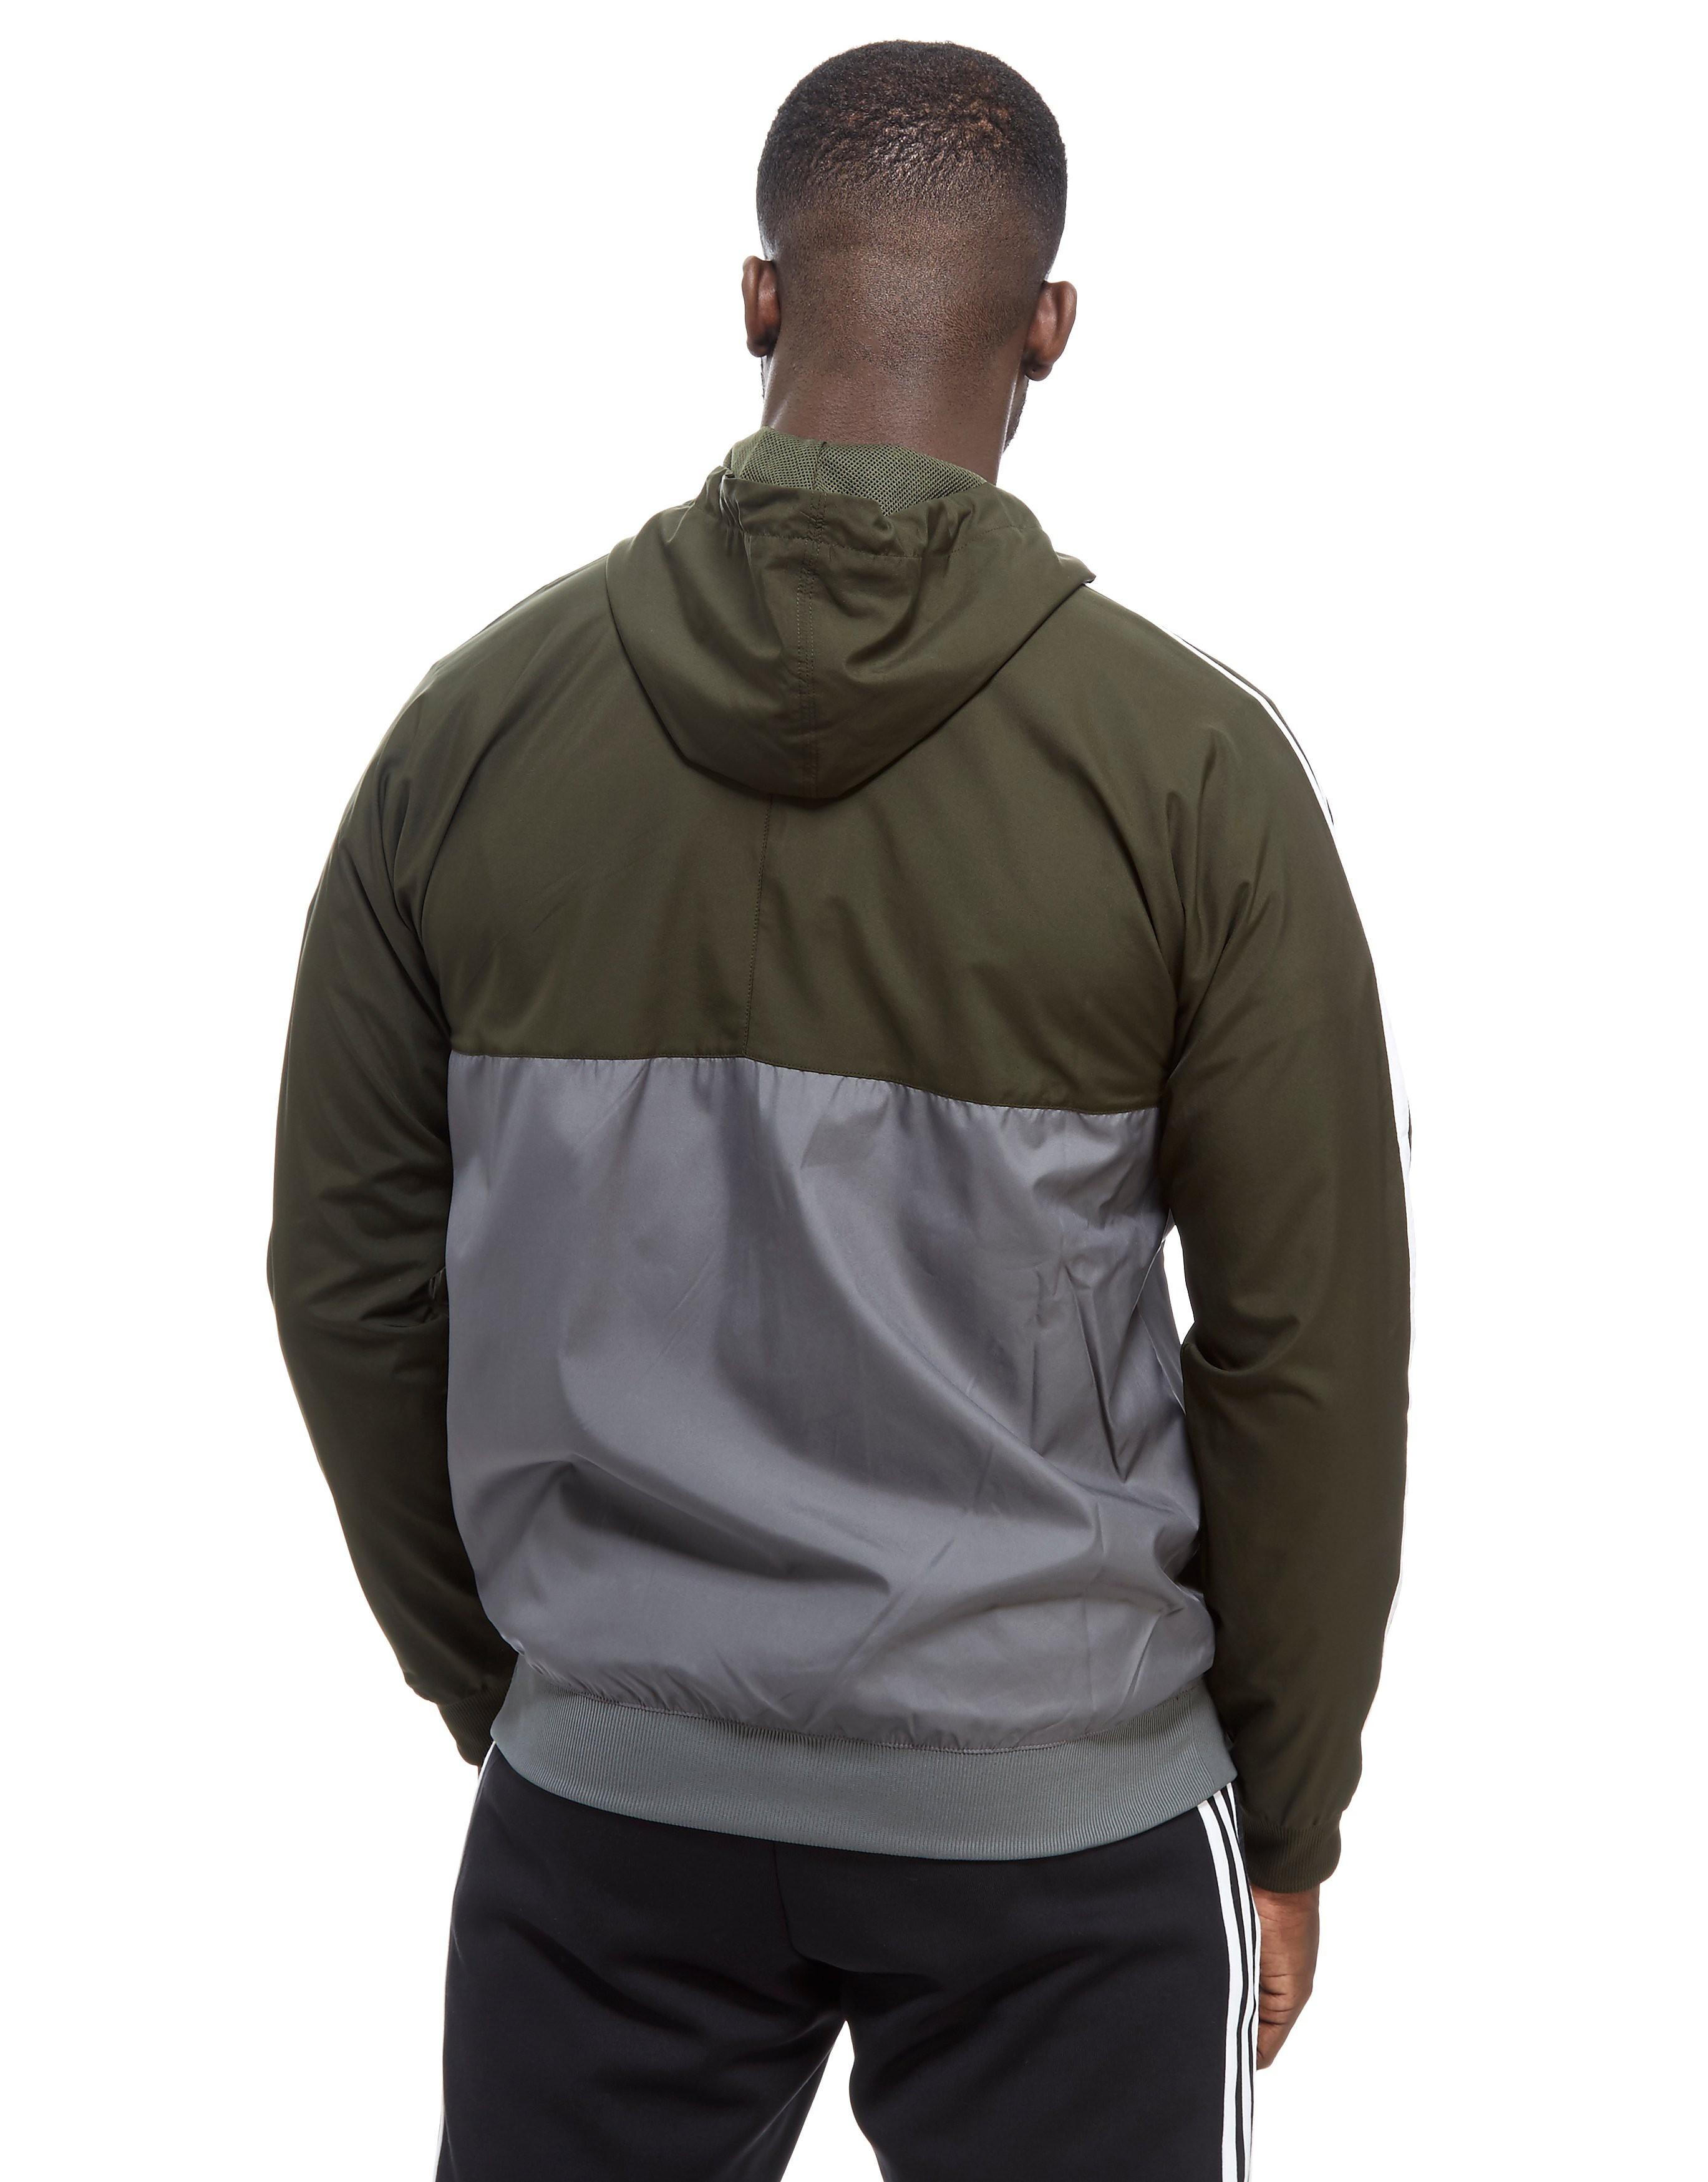 adidas Originals Marathon 83 Jacket